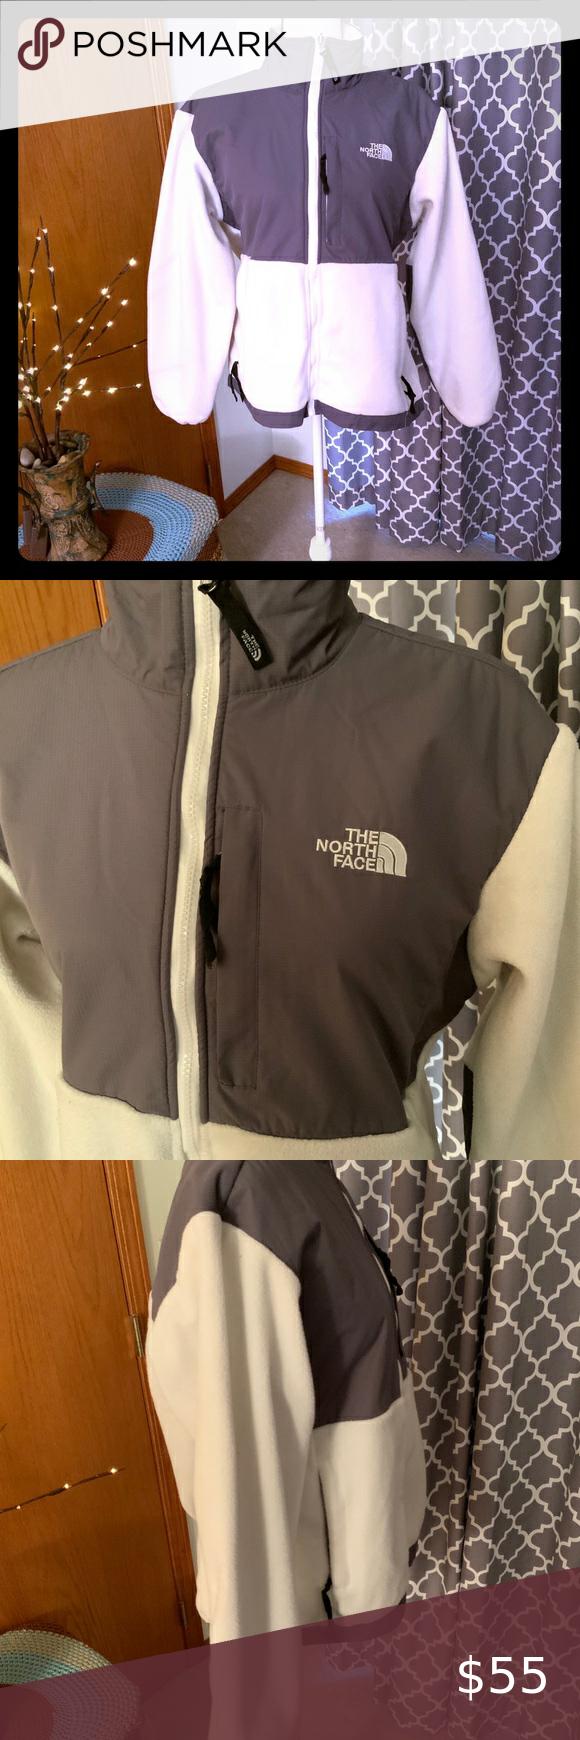 Womens North Face Jacket Size Xl Gray White North Face Jacket Womens North Face Women North Face Jacket [ 1740 x 580 Pixel ]